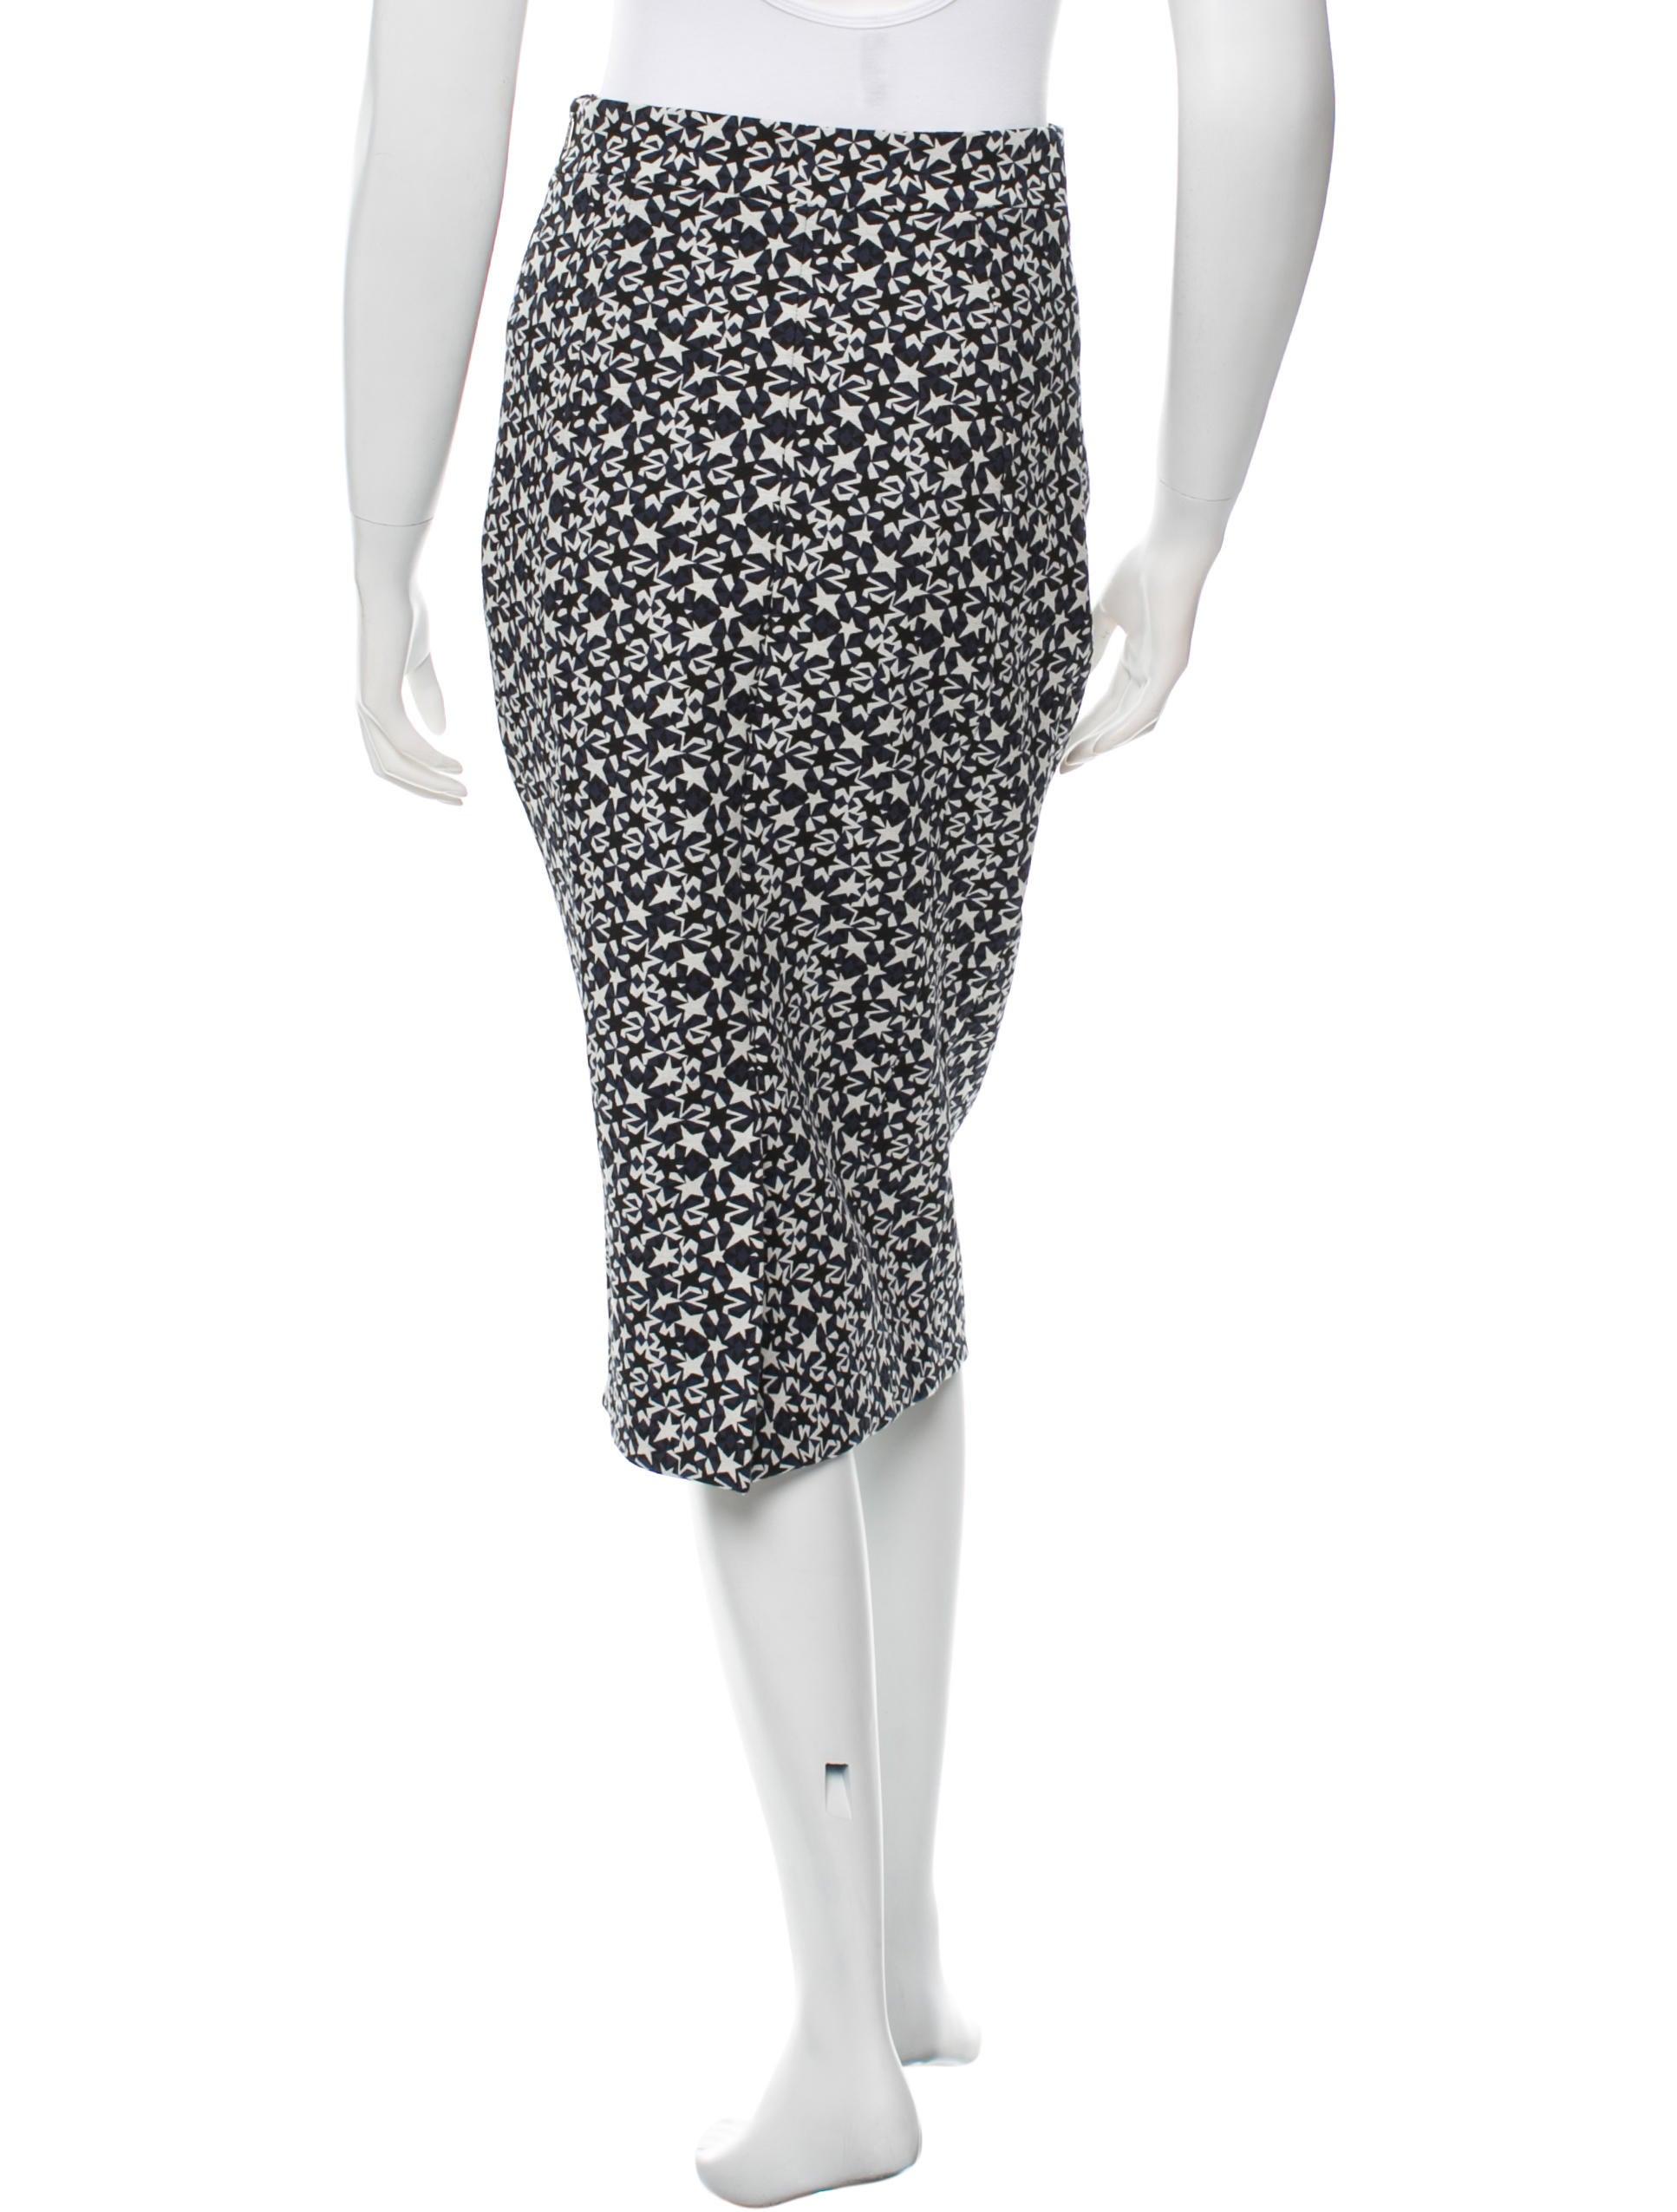 neil barrett patterned pencil skirt w tags clothing